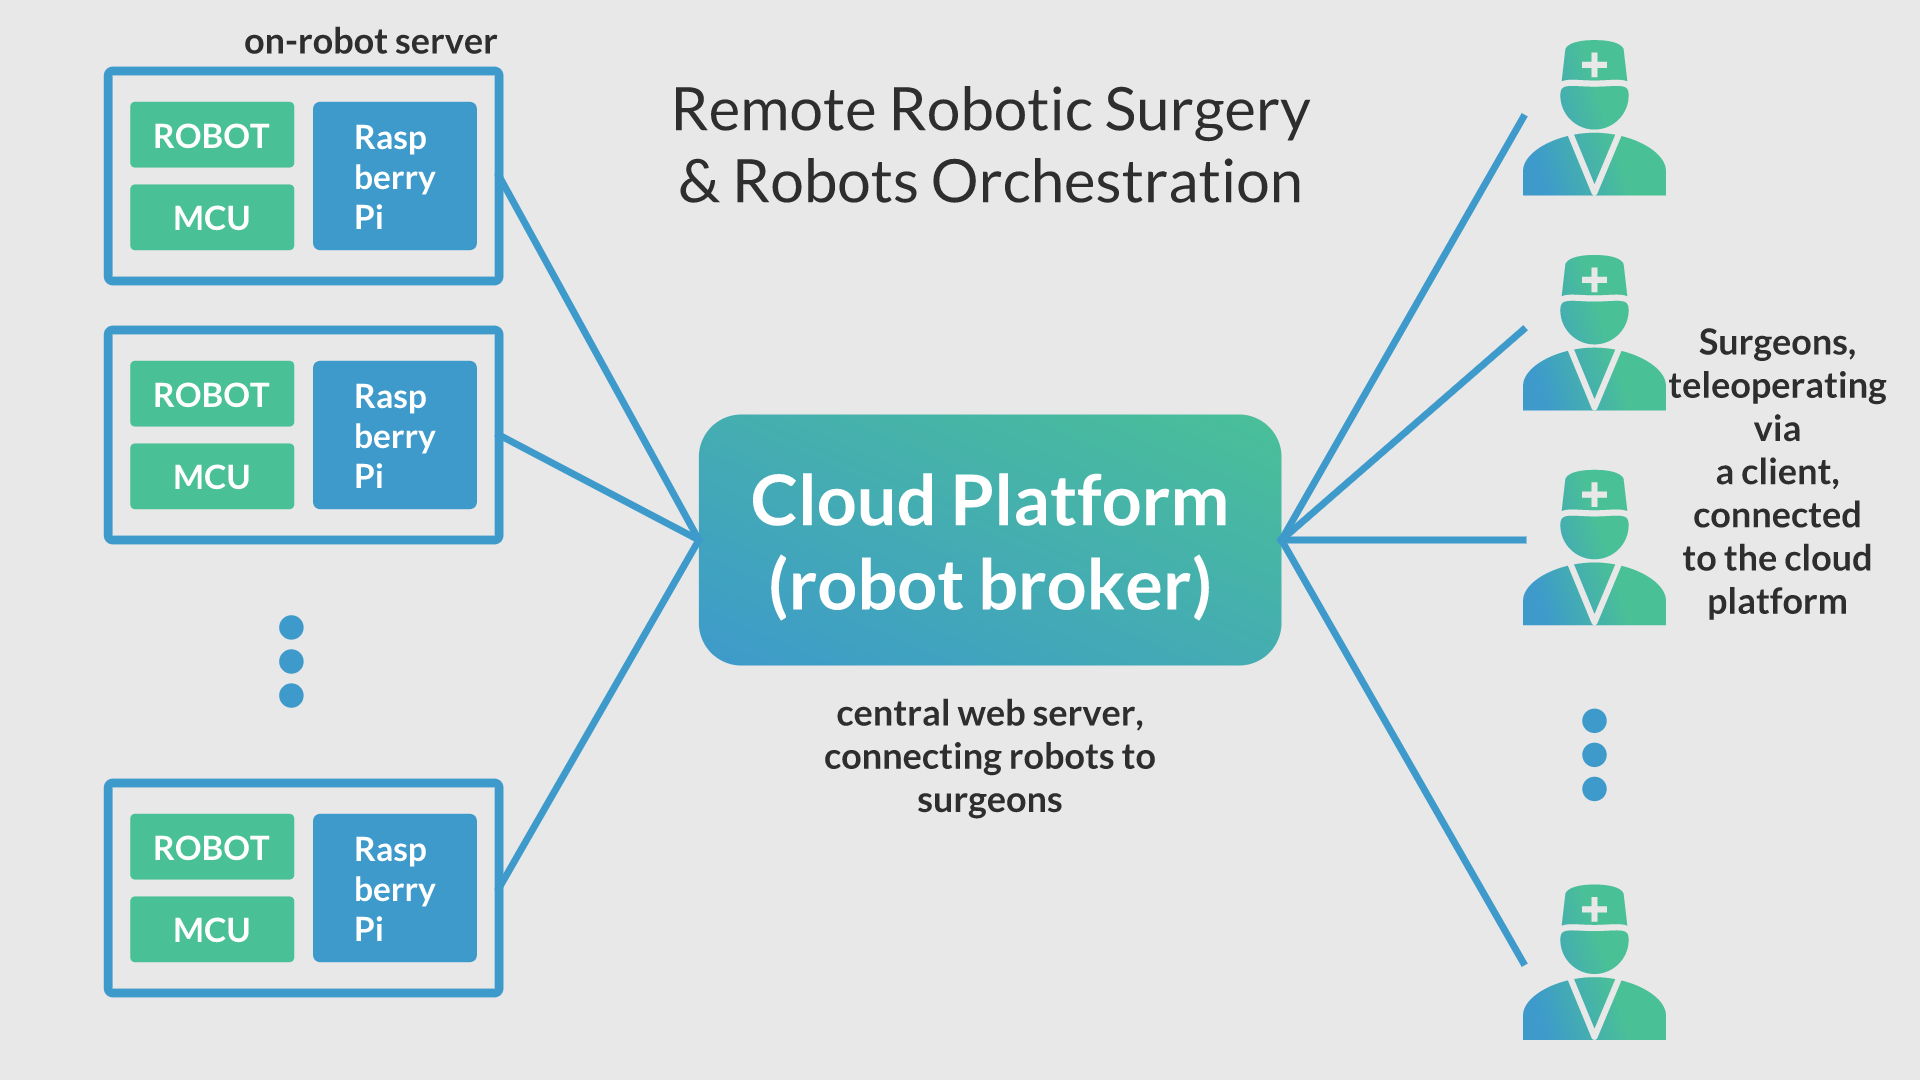 Remote Robotic Surgery & Robots Orchestration | Details | Hackaday io